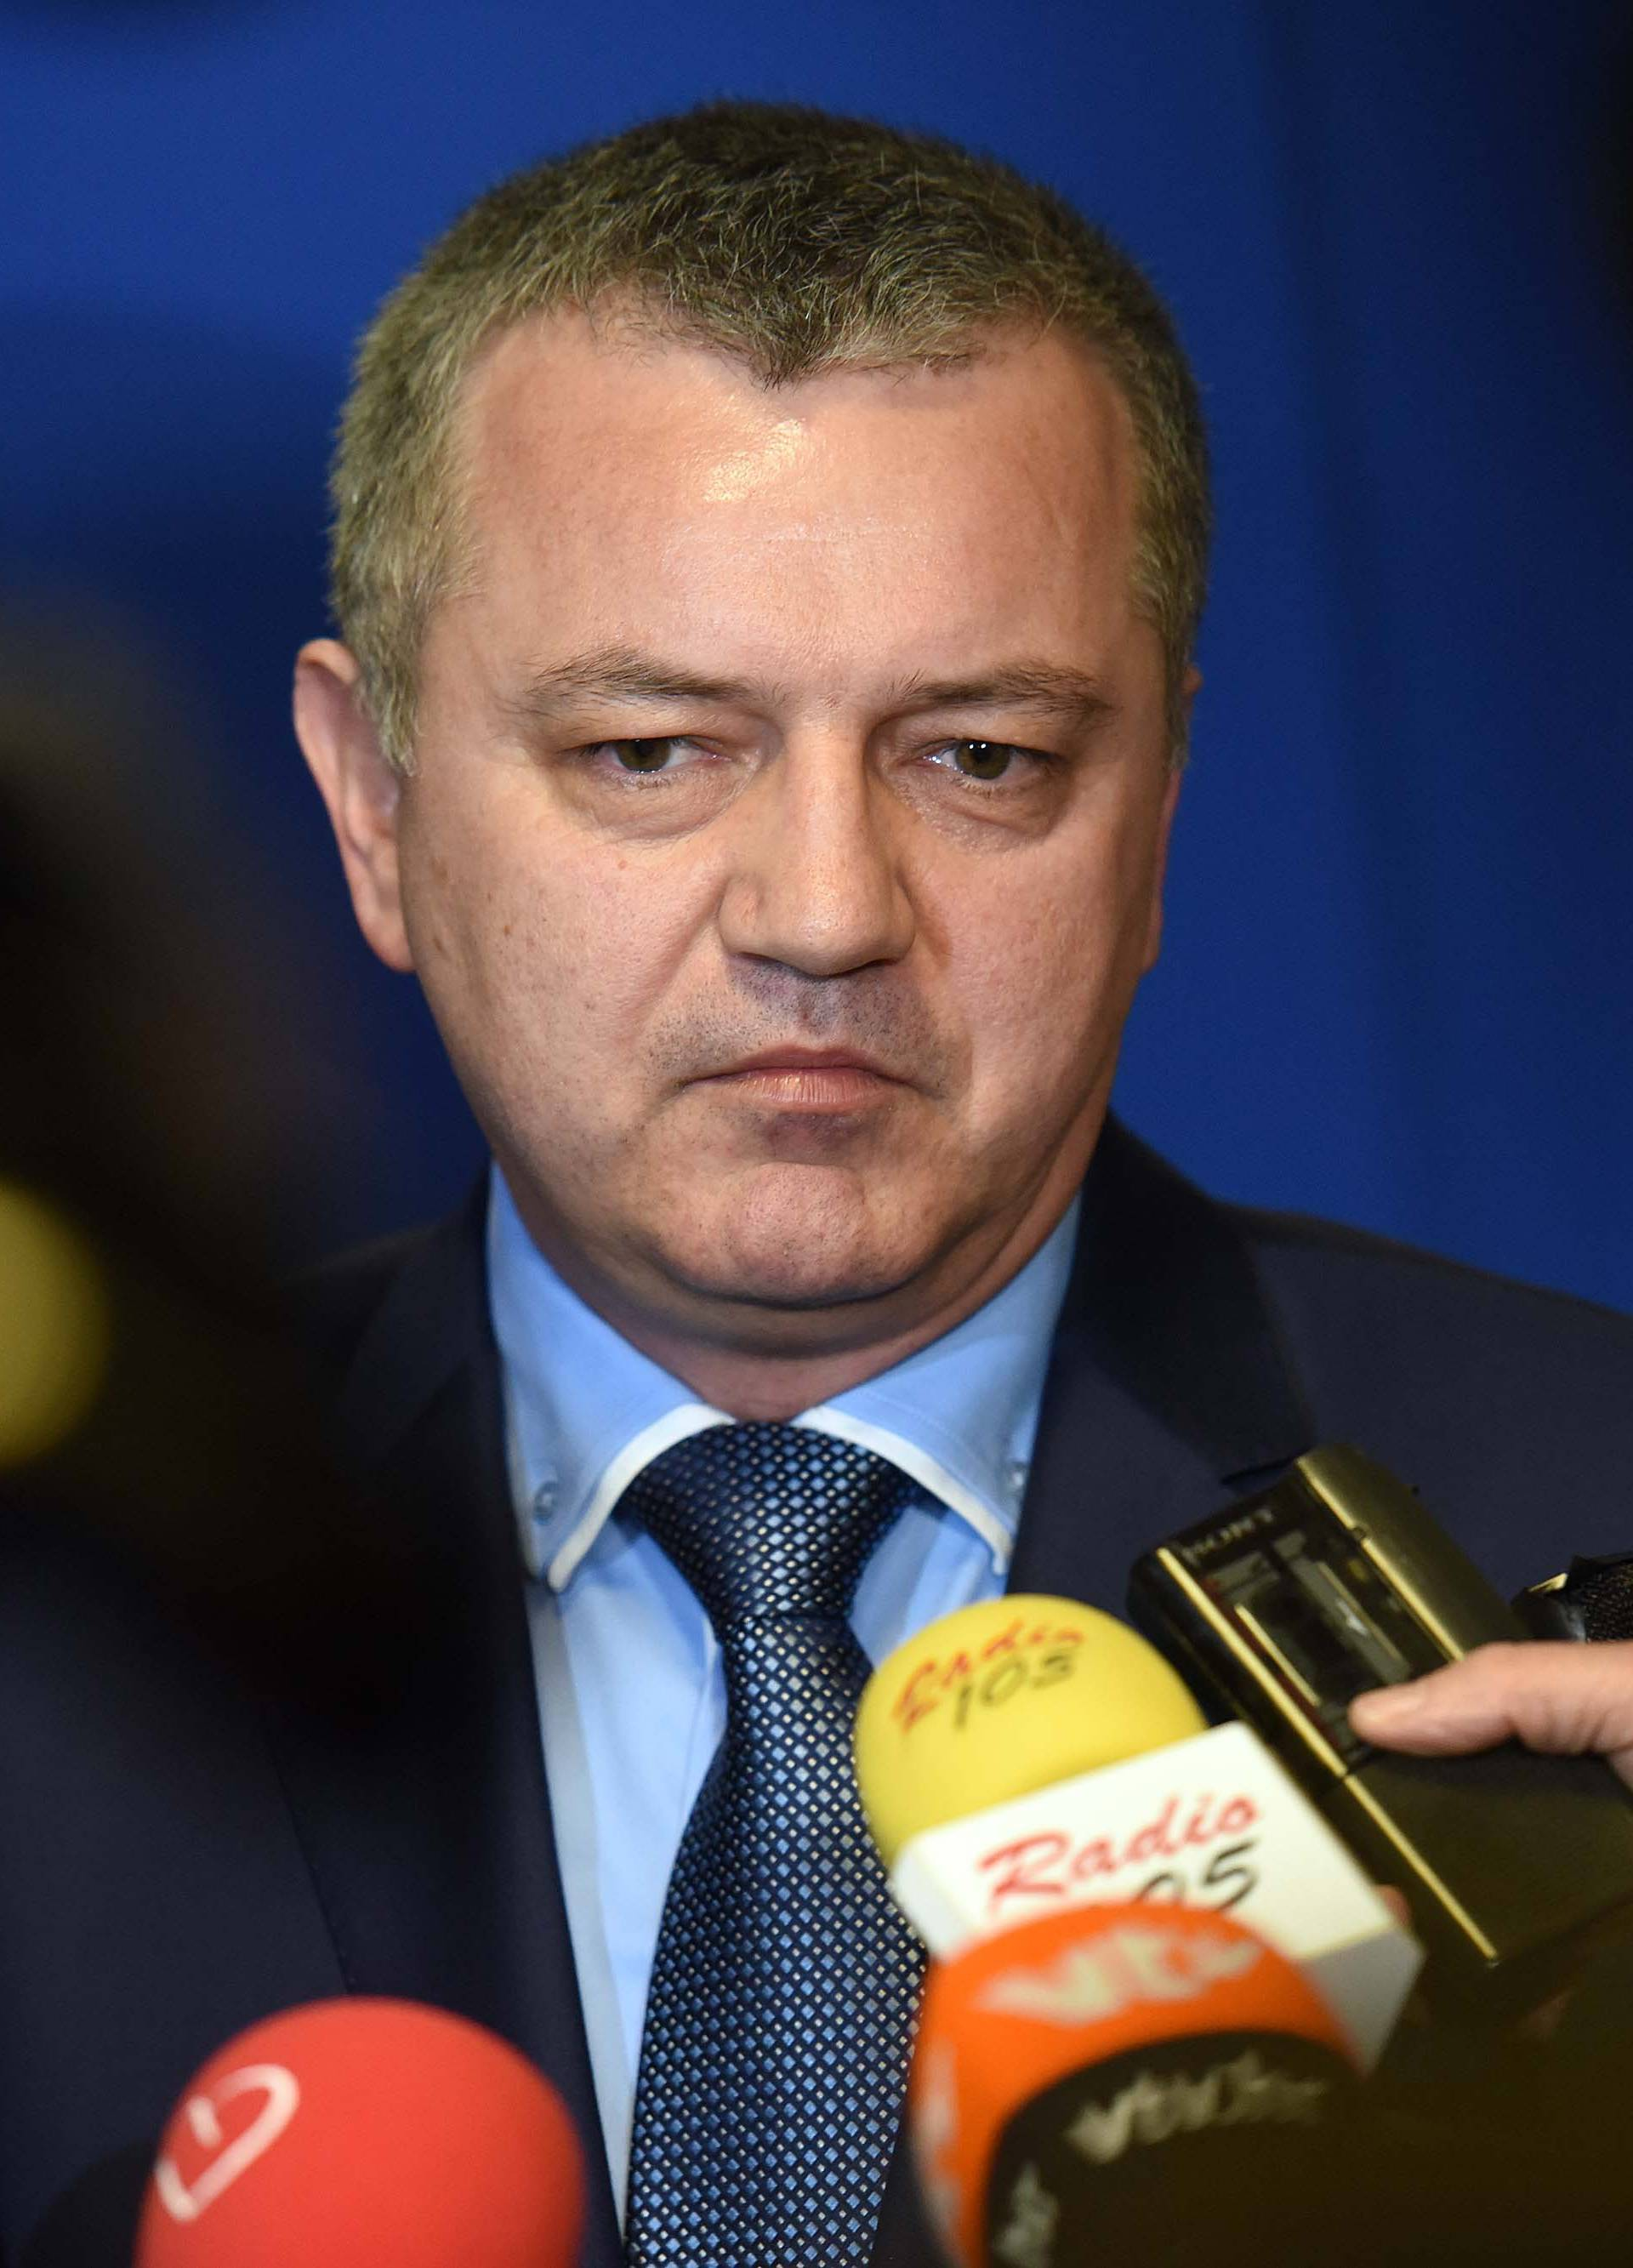 Horvat: Premijer se ne miješa i ne utječe na proces nagodbe